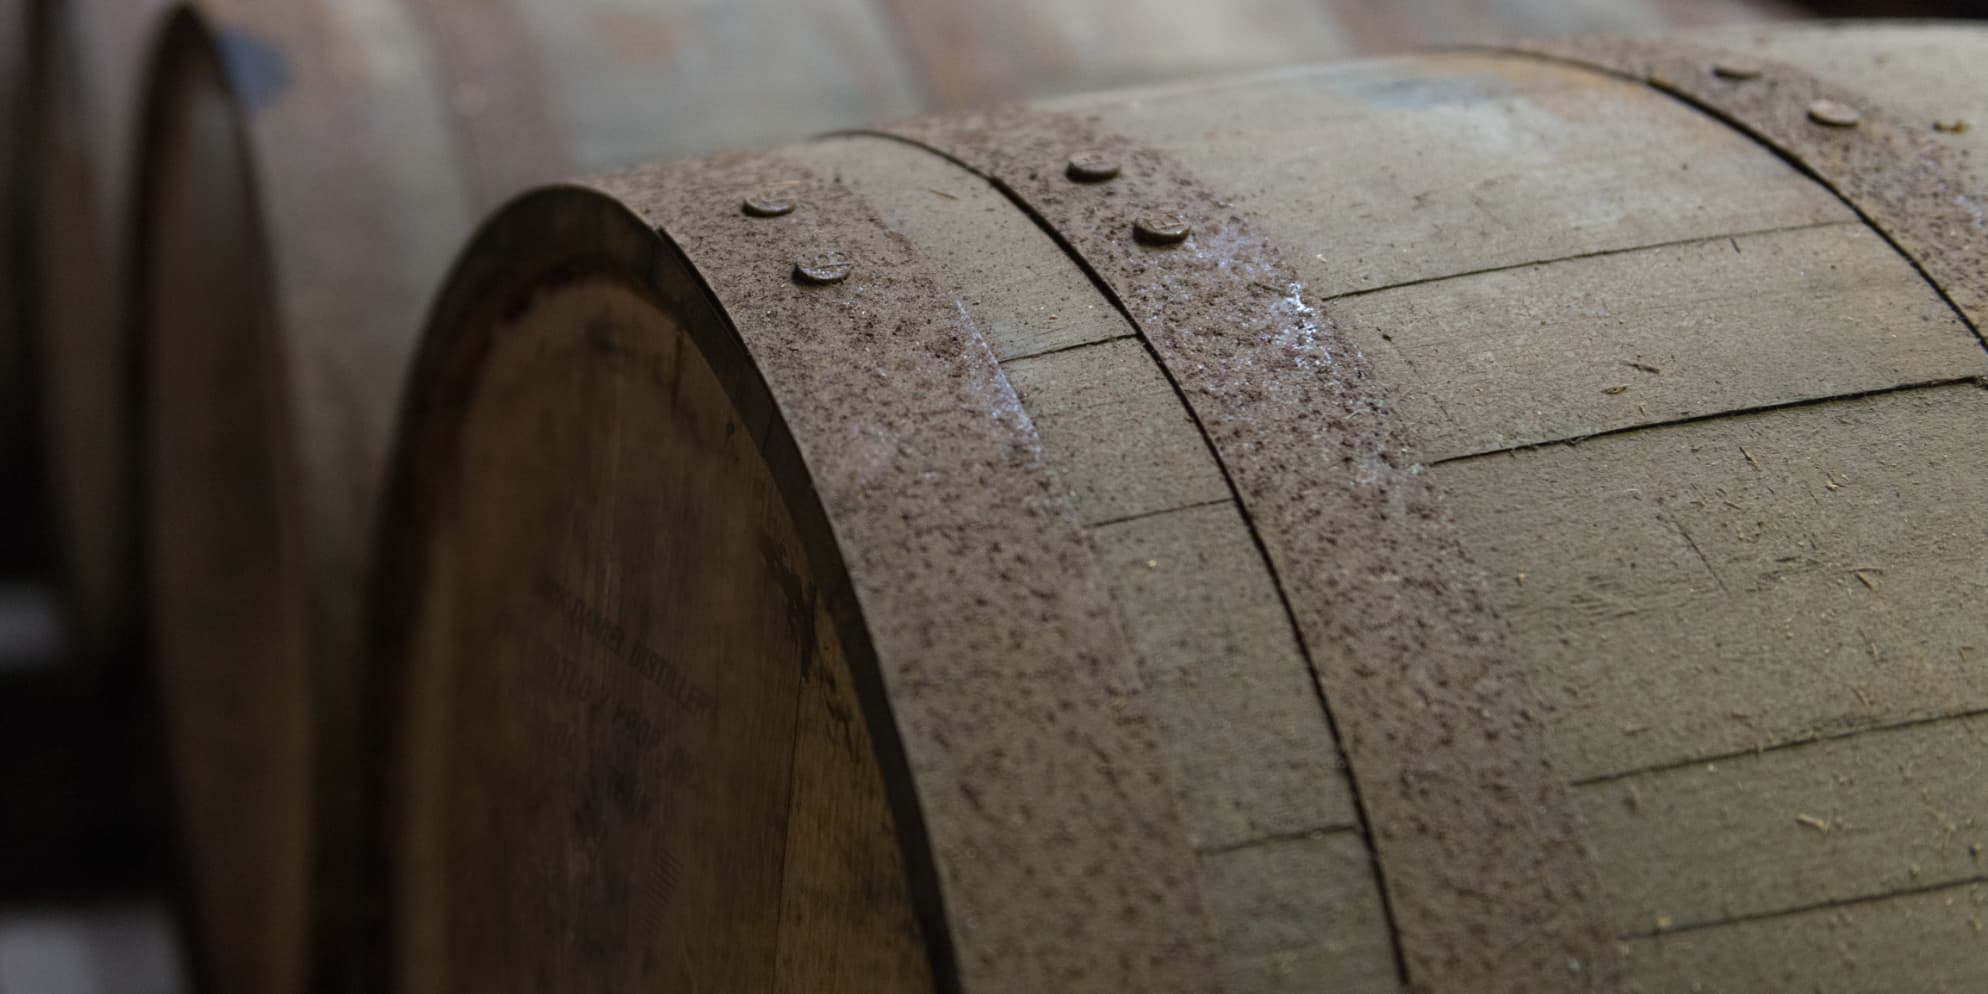 Ballantine's Scotch Whisky in Oak Casks